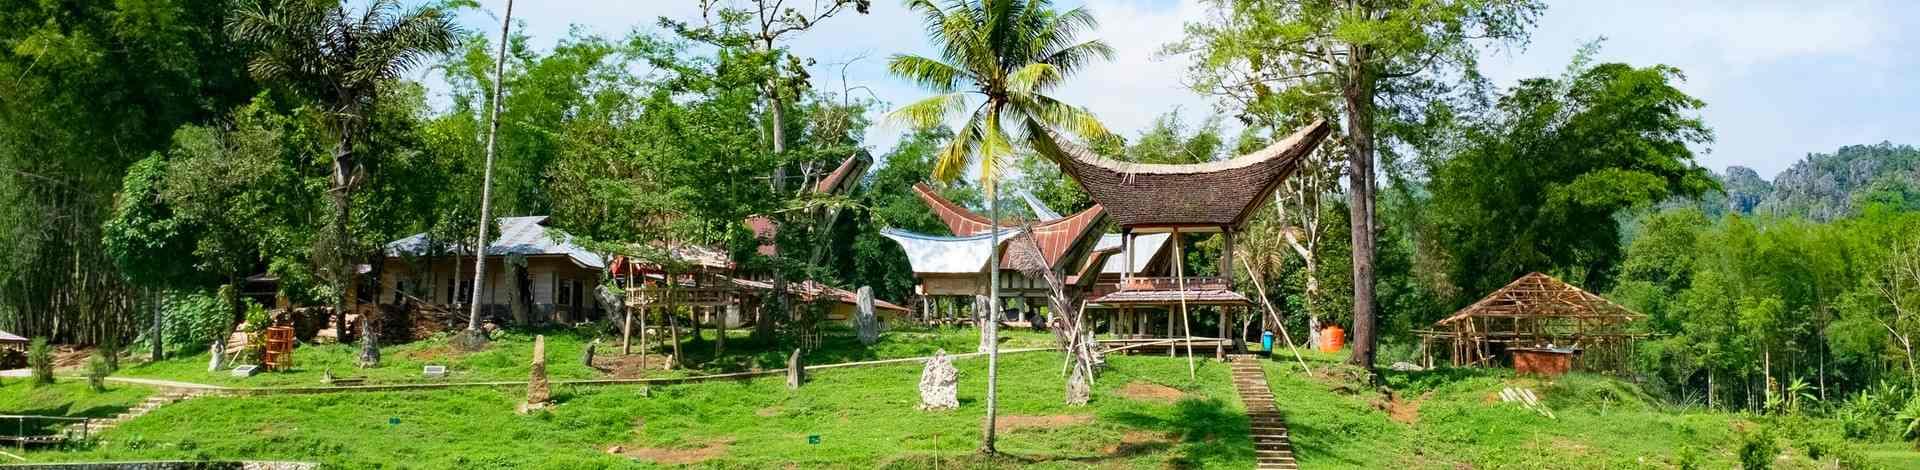 Célèbes Sulawesi Pays Toraja